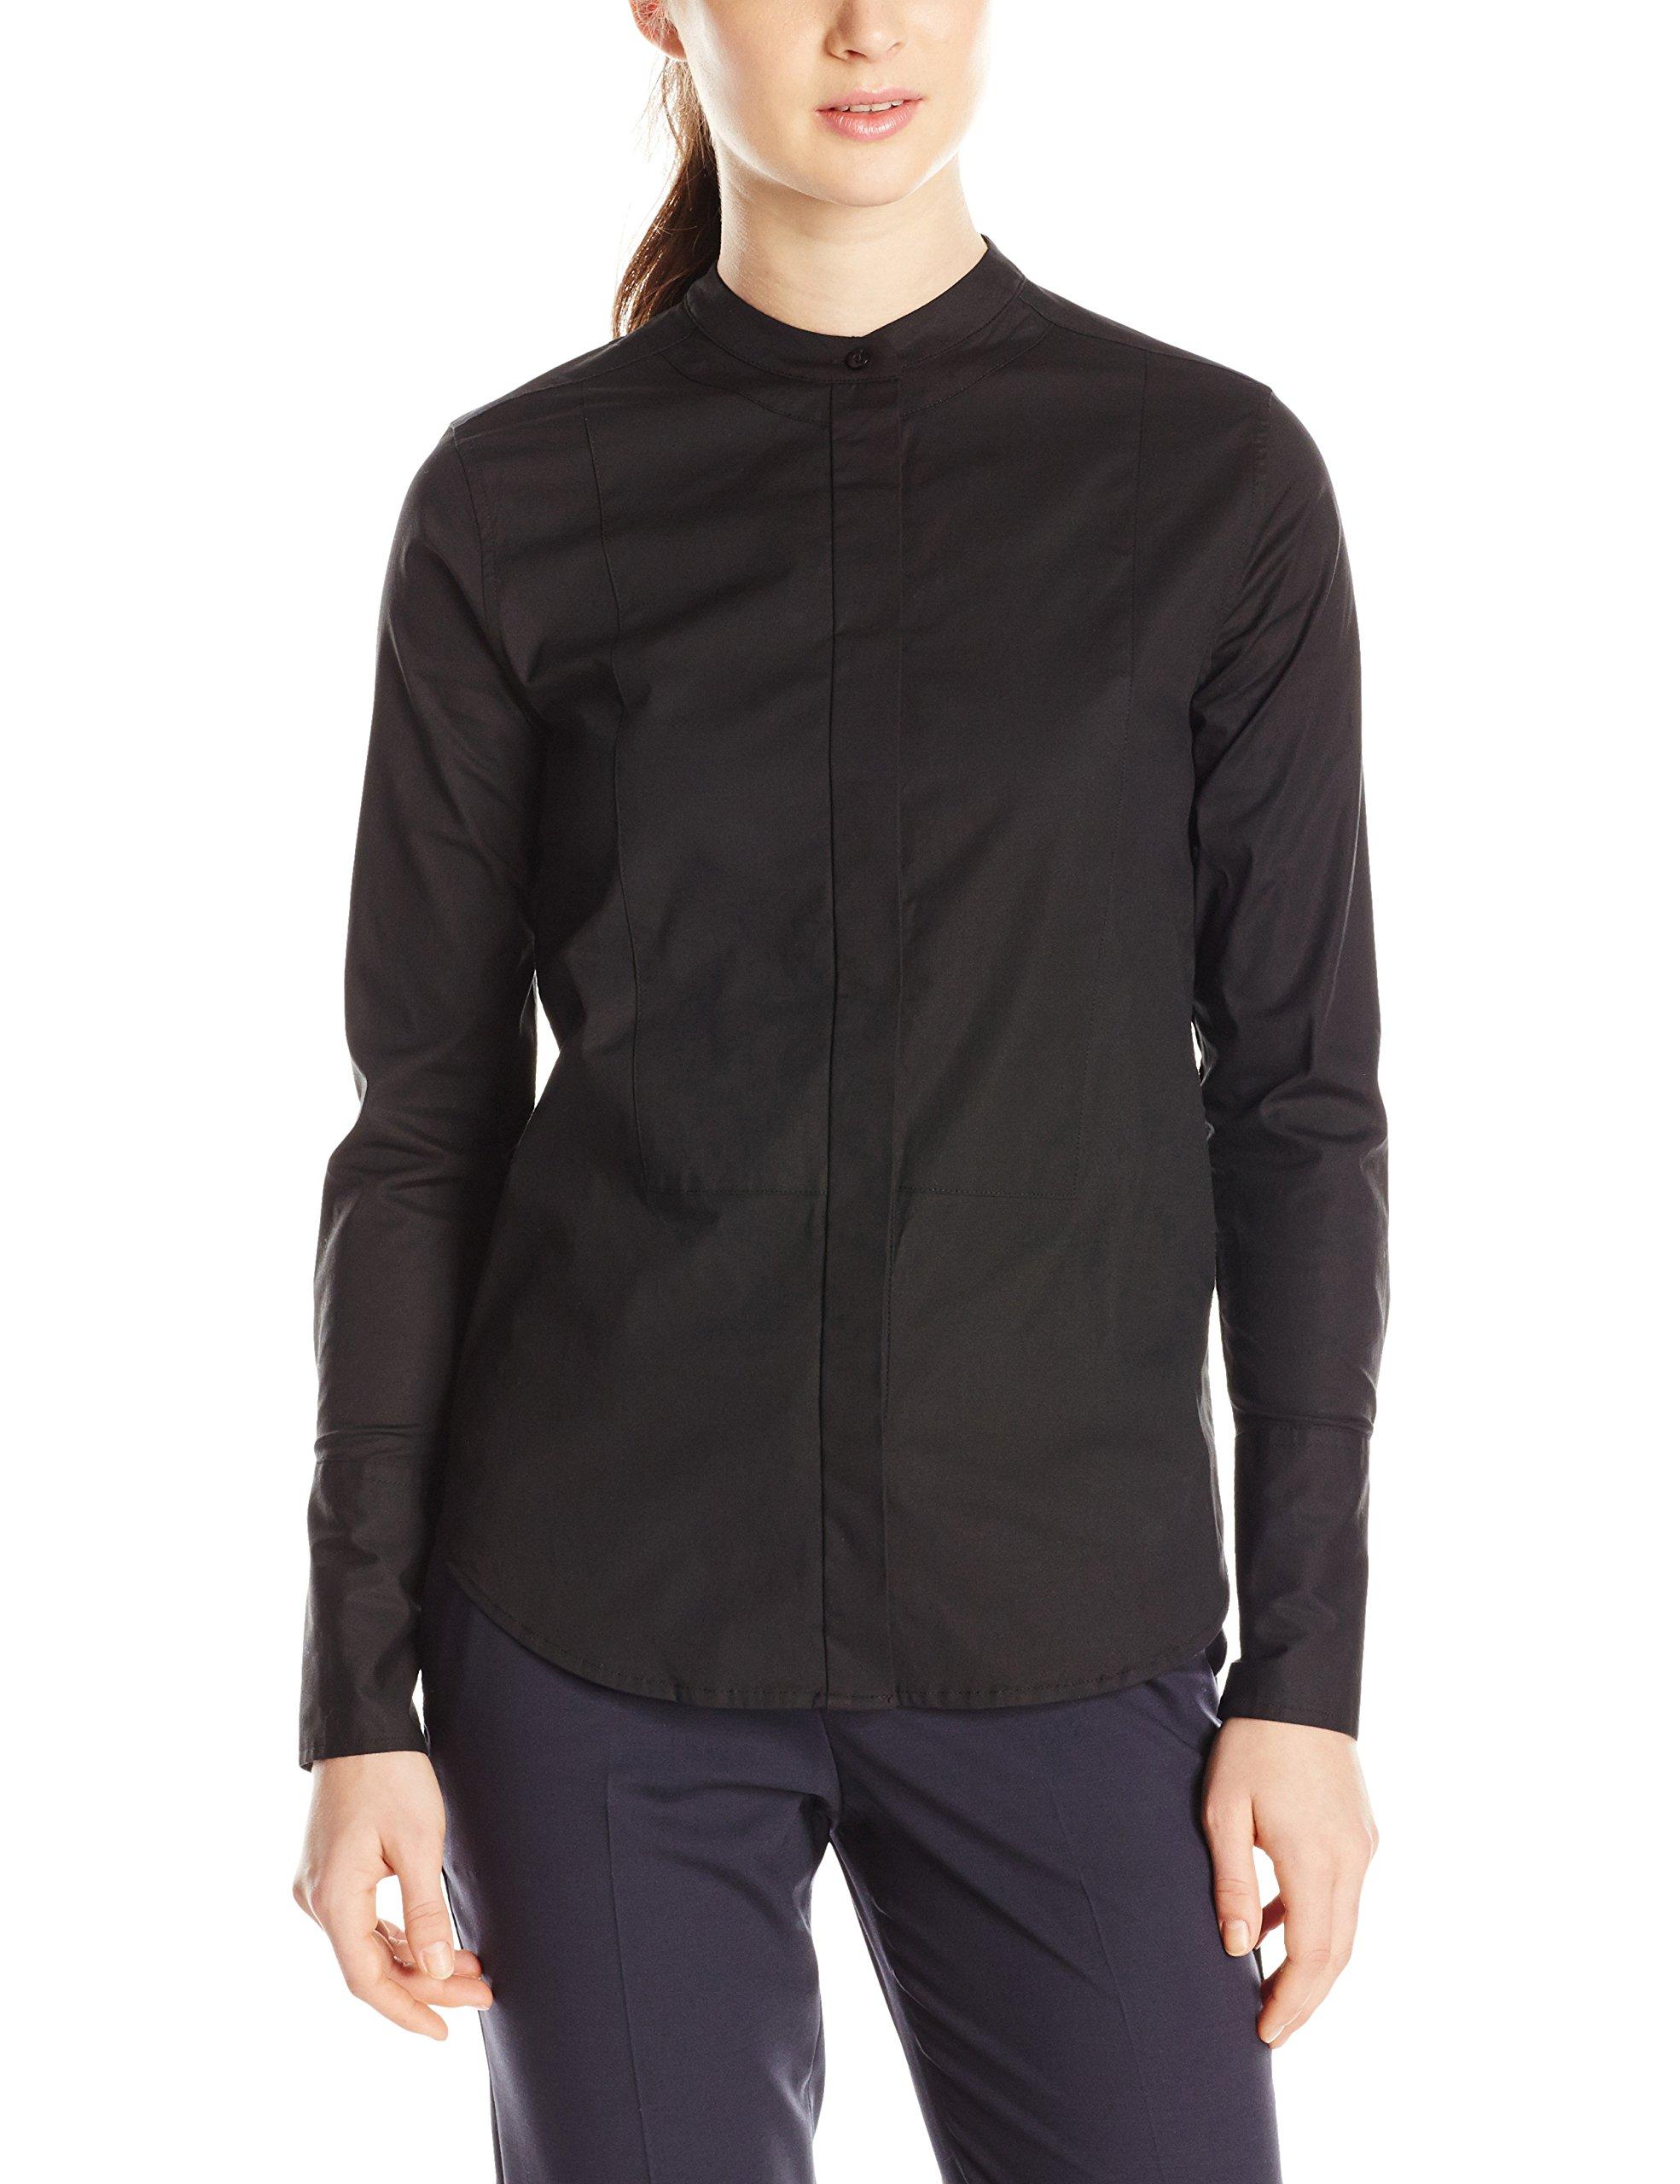 Dickies Girl Junior's Long Sleeve Mandarin Collar Bib Shirt, Black, X-Large by Dickies Girl (Image #2)